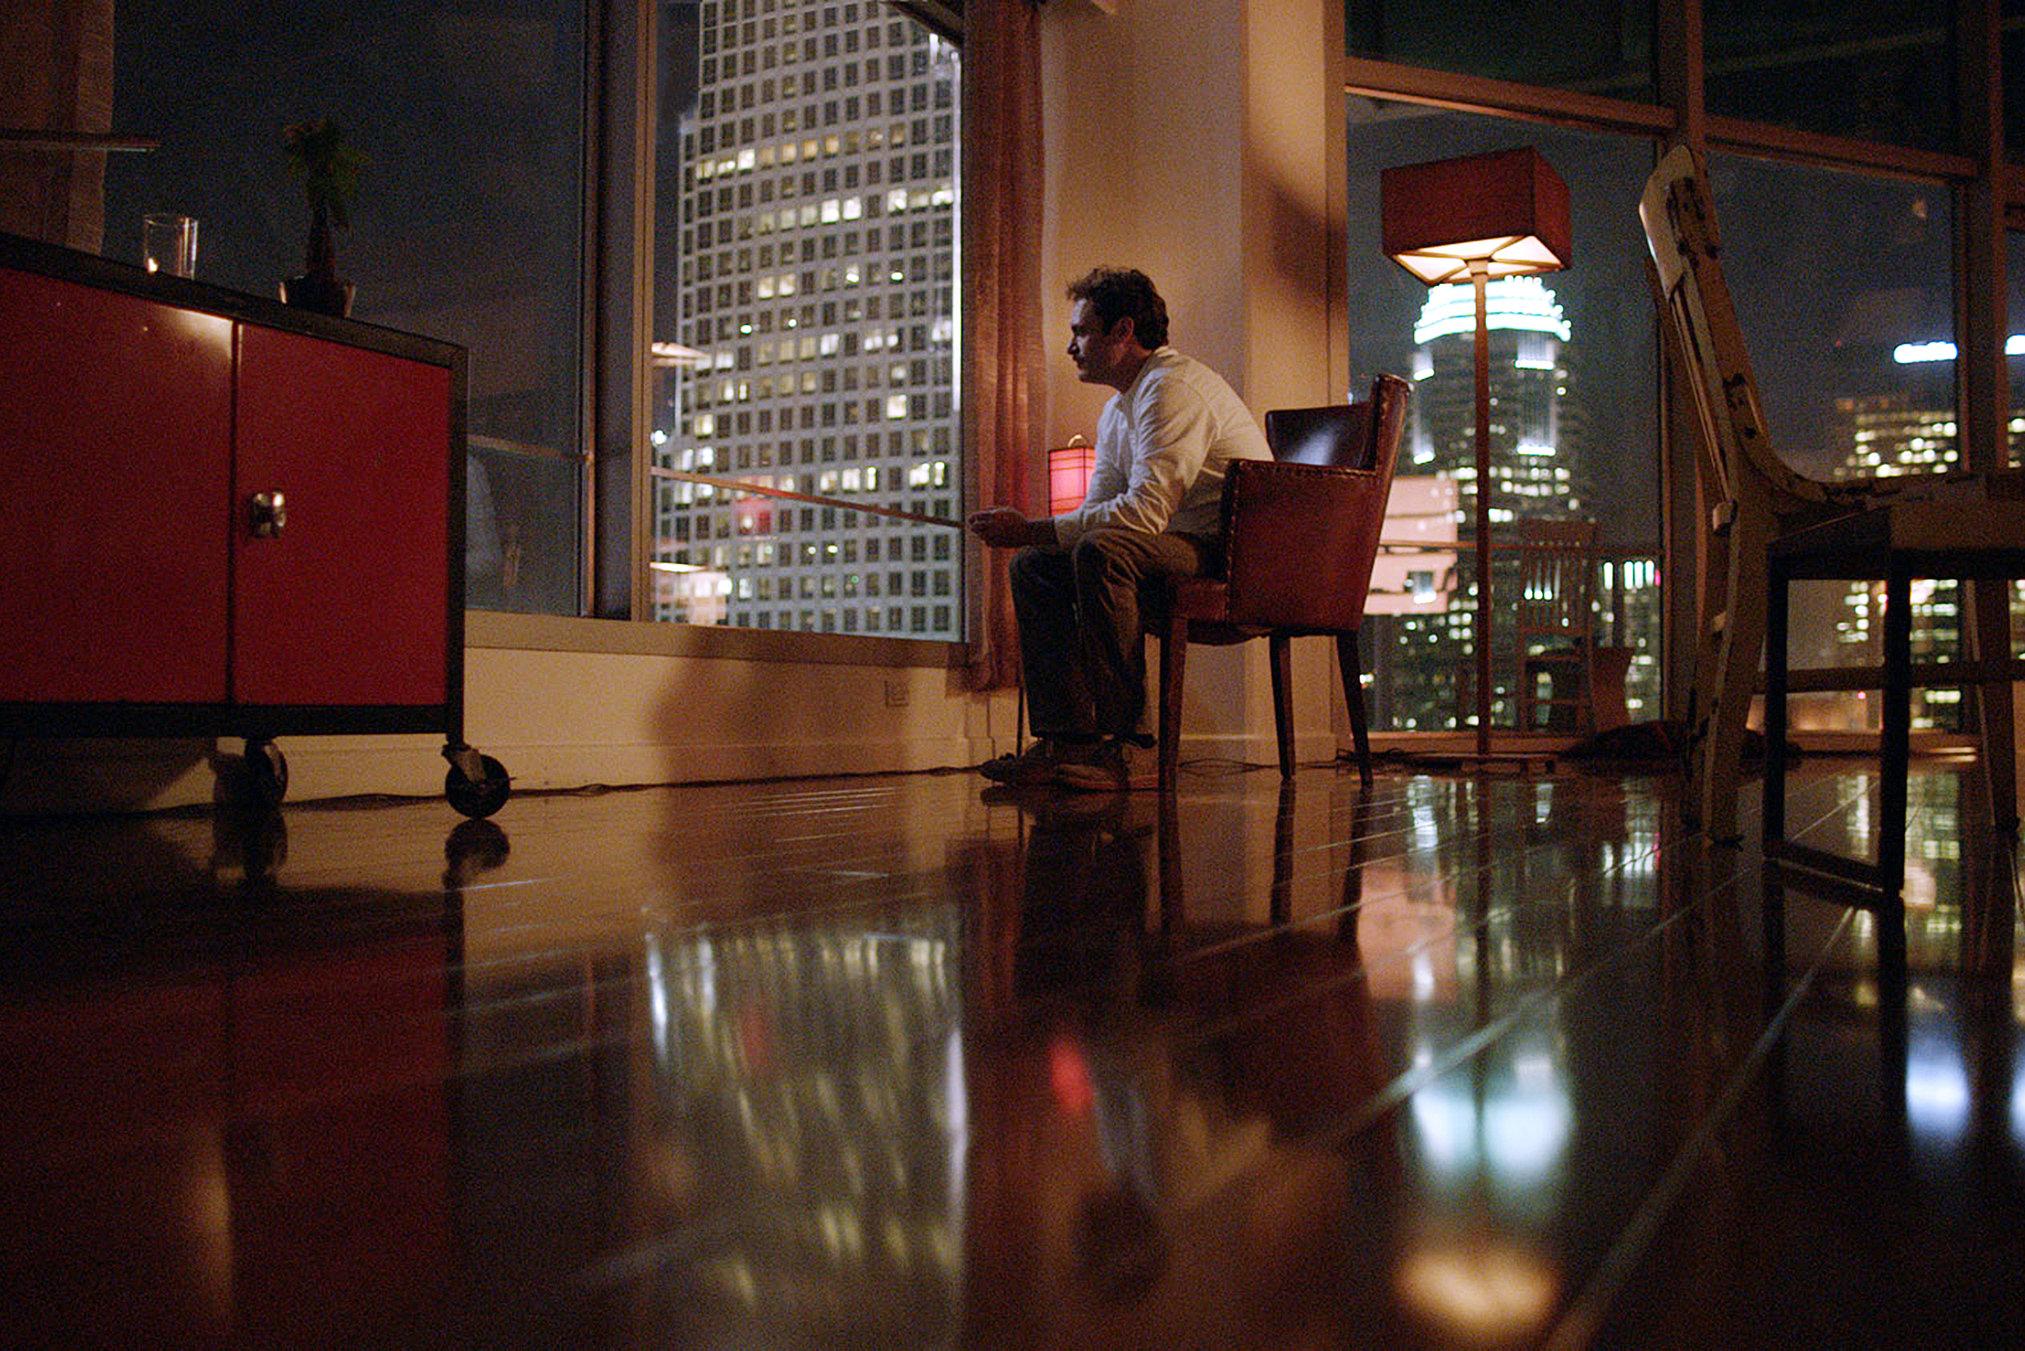 New York Film Festival 2013: Her Review